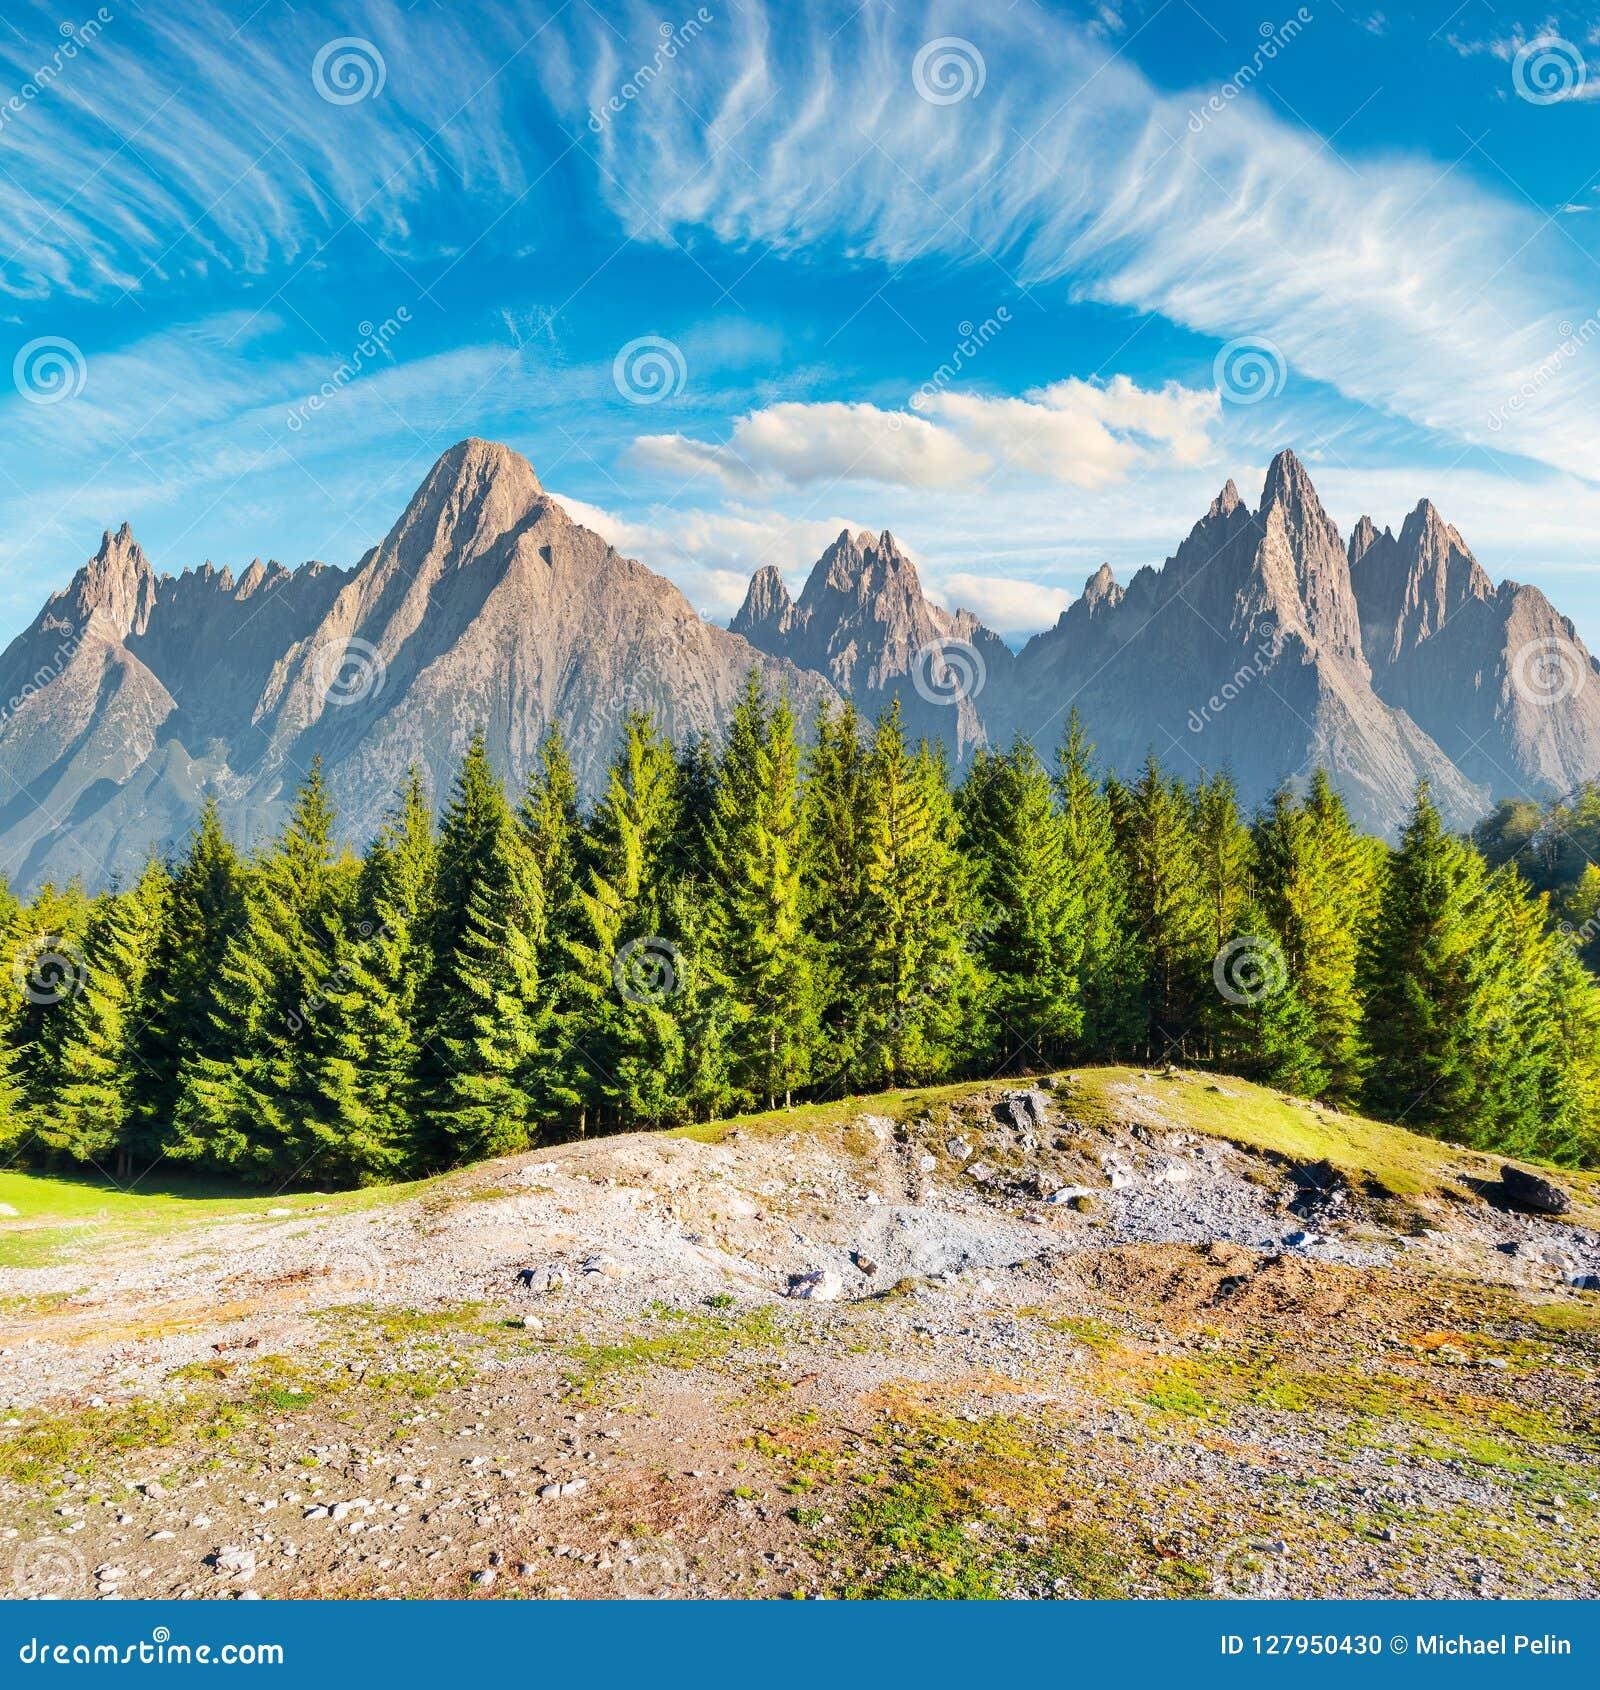 Composite image of High Tatra mountains